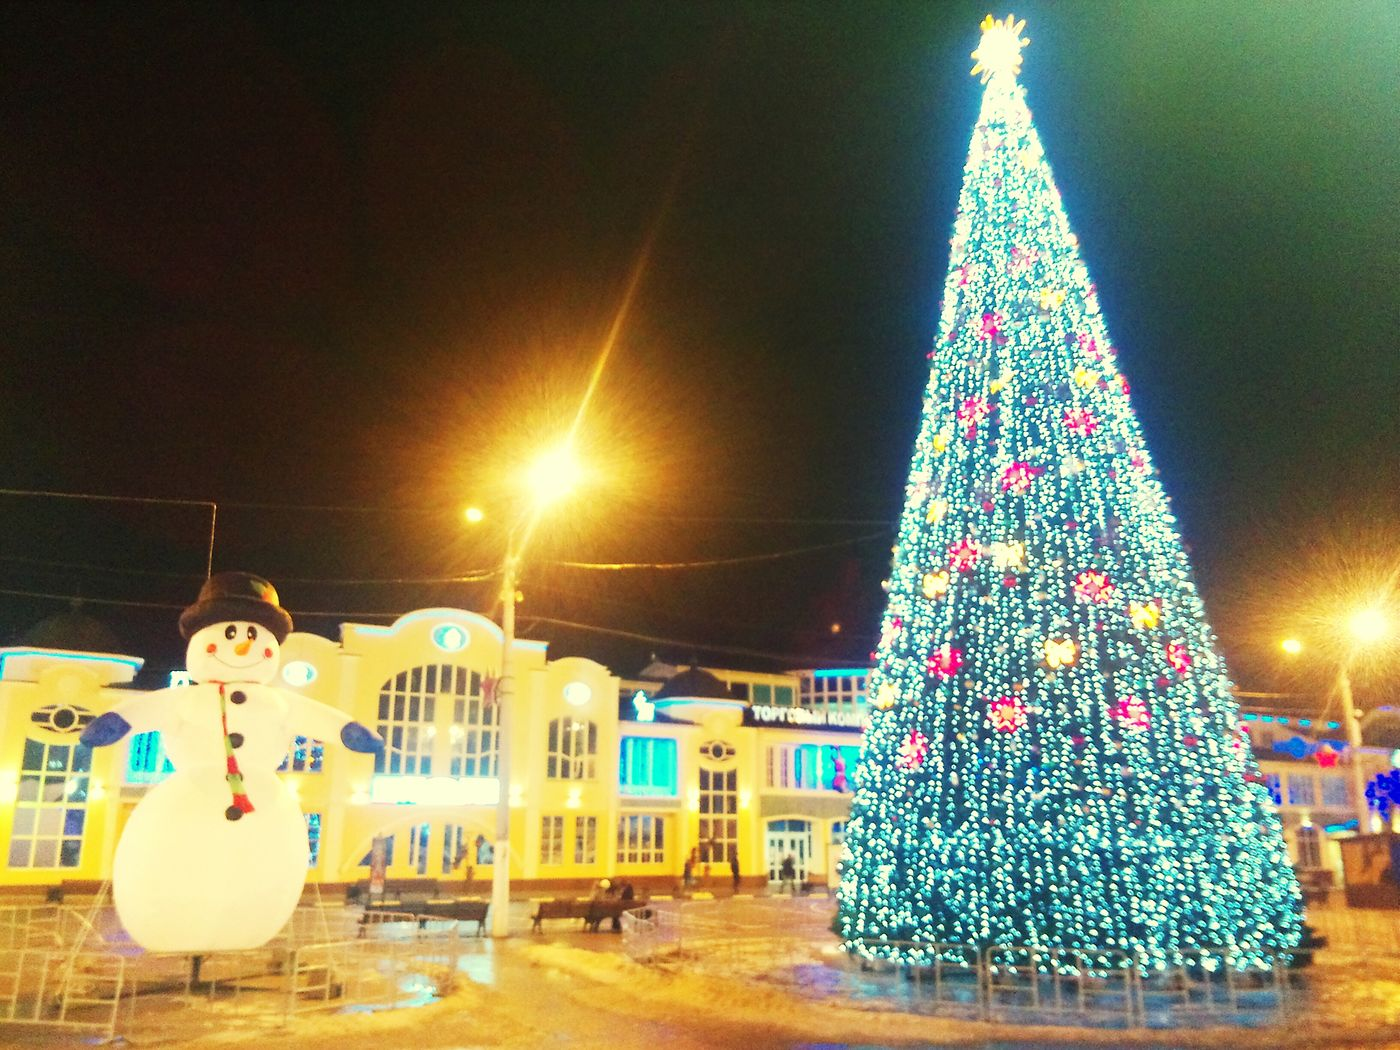 Новый Год на носу ногинск нг2015 новыйгод ёлка First Eyeem Photo